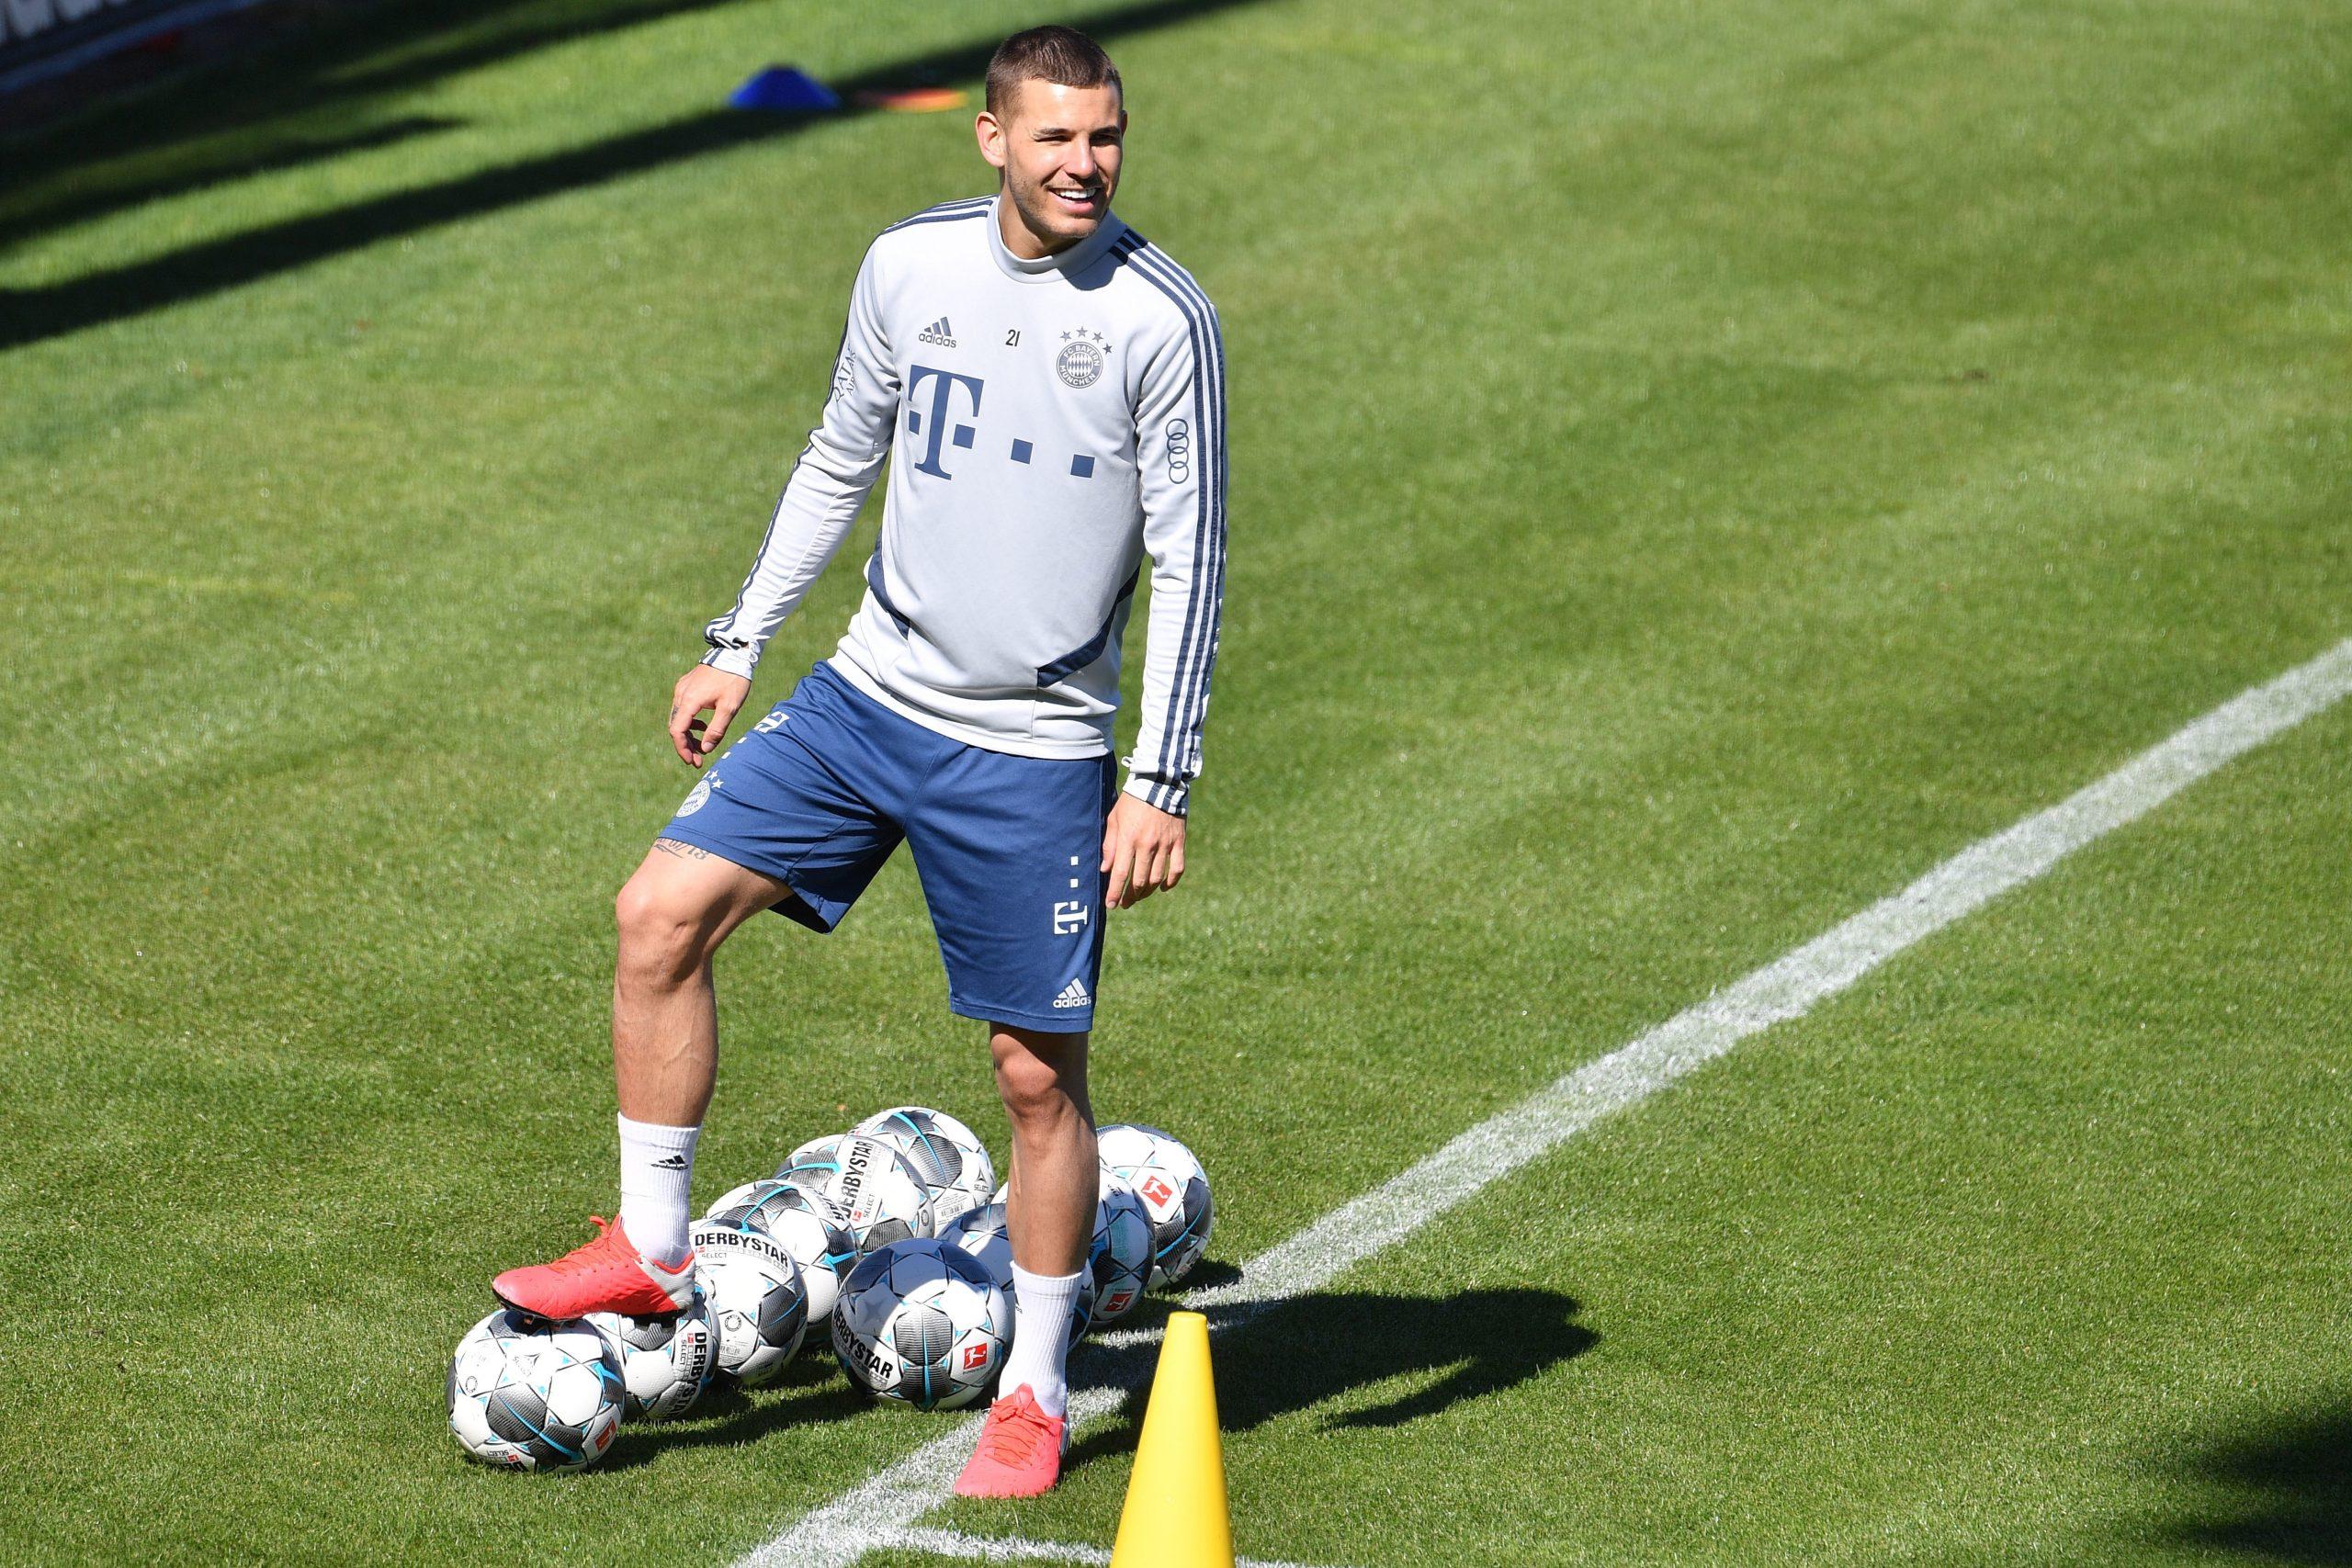 Mercato - Lucas Hernandez a demandé au Bayern de pouvoir partir au PSG, selon Foot Mercato